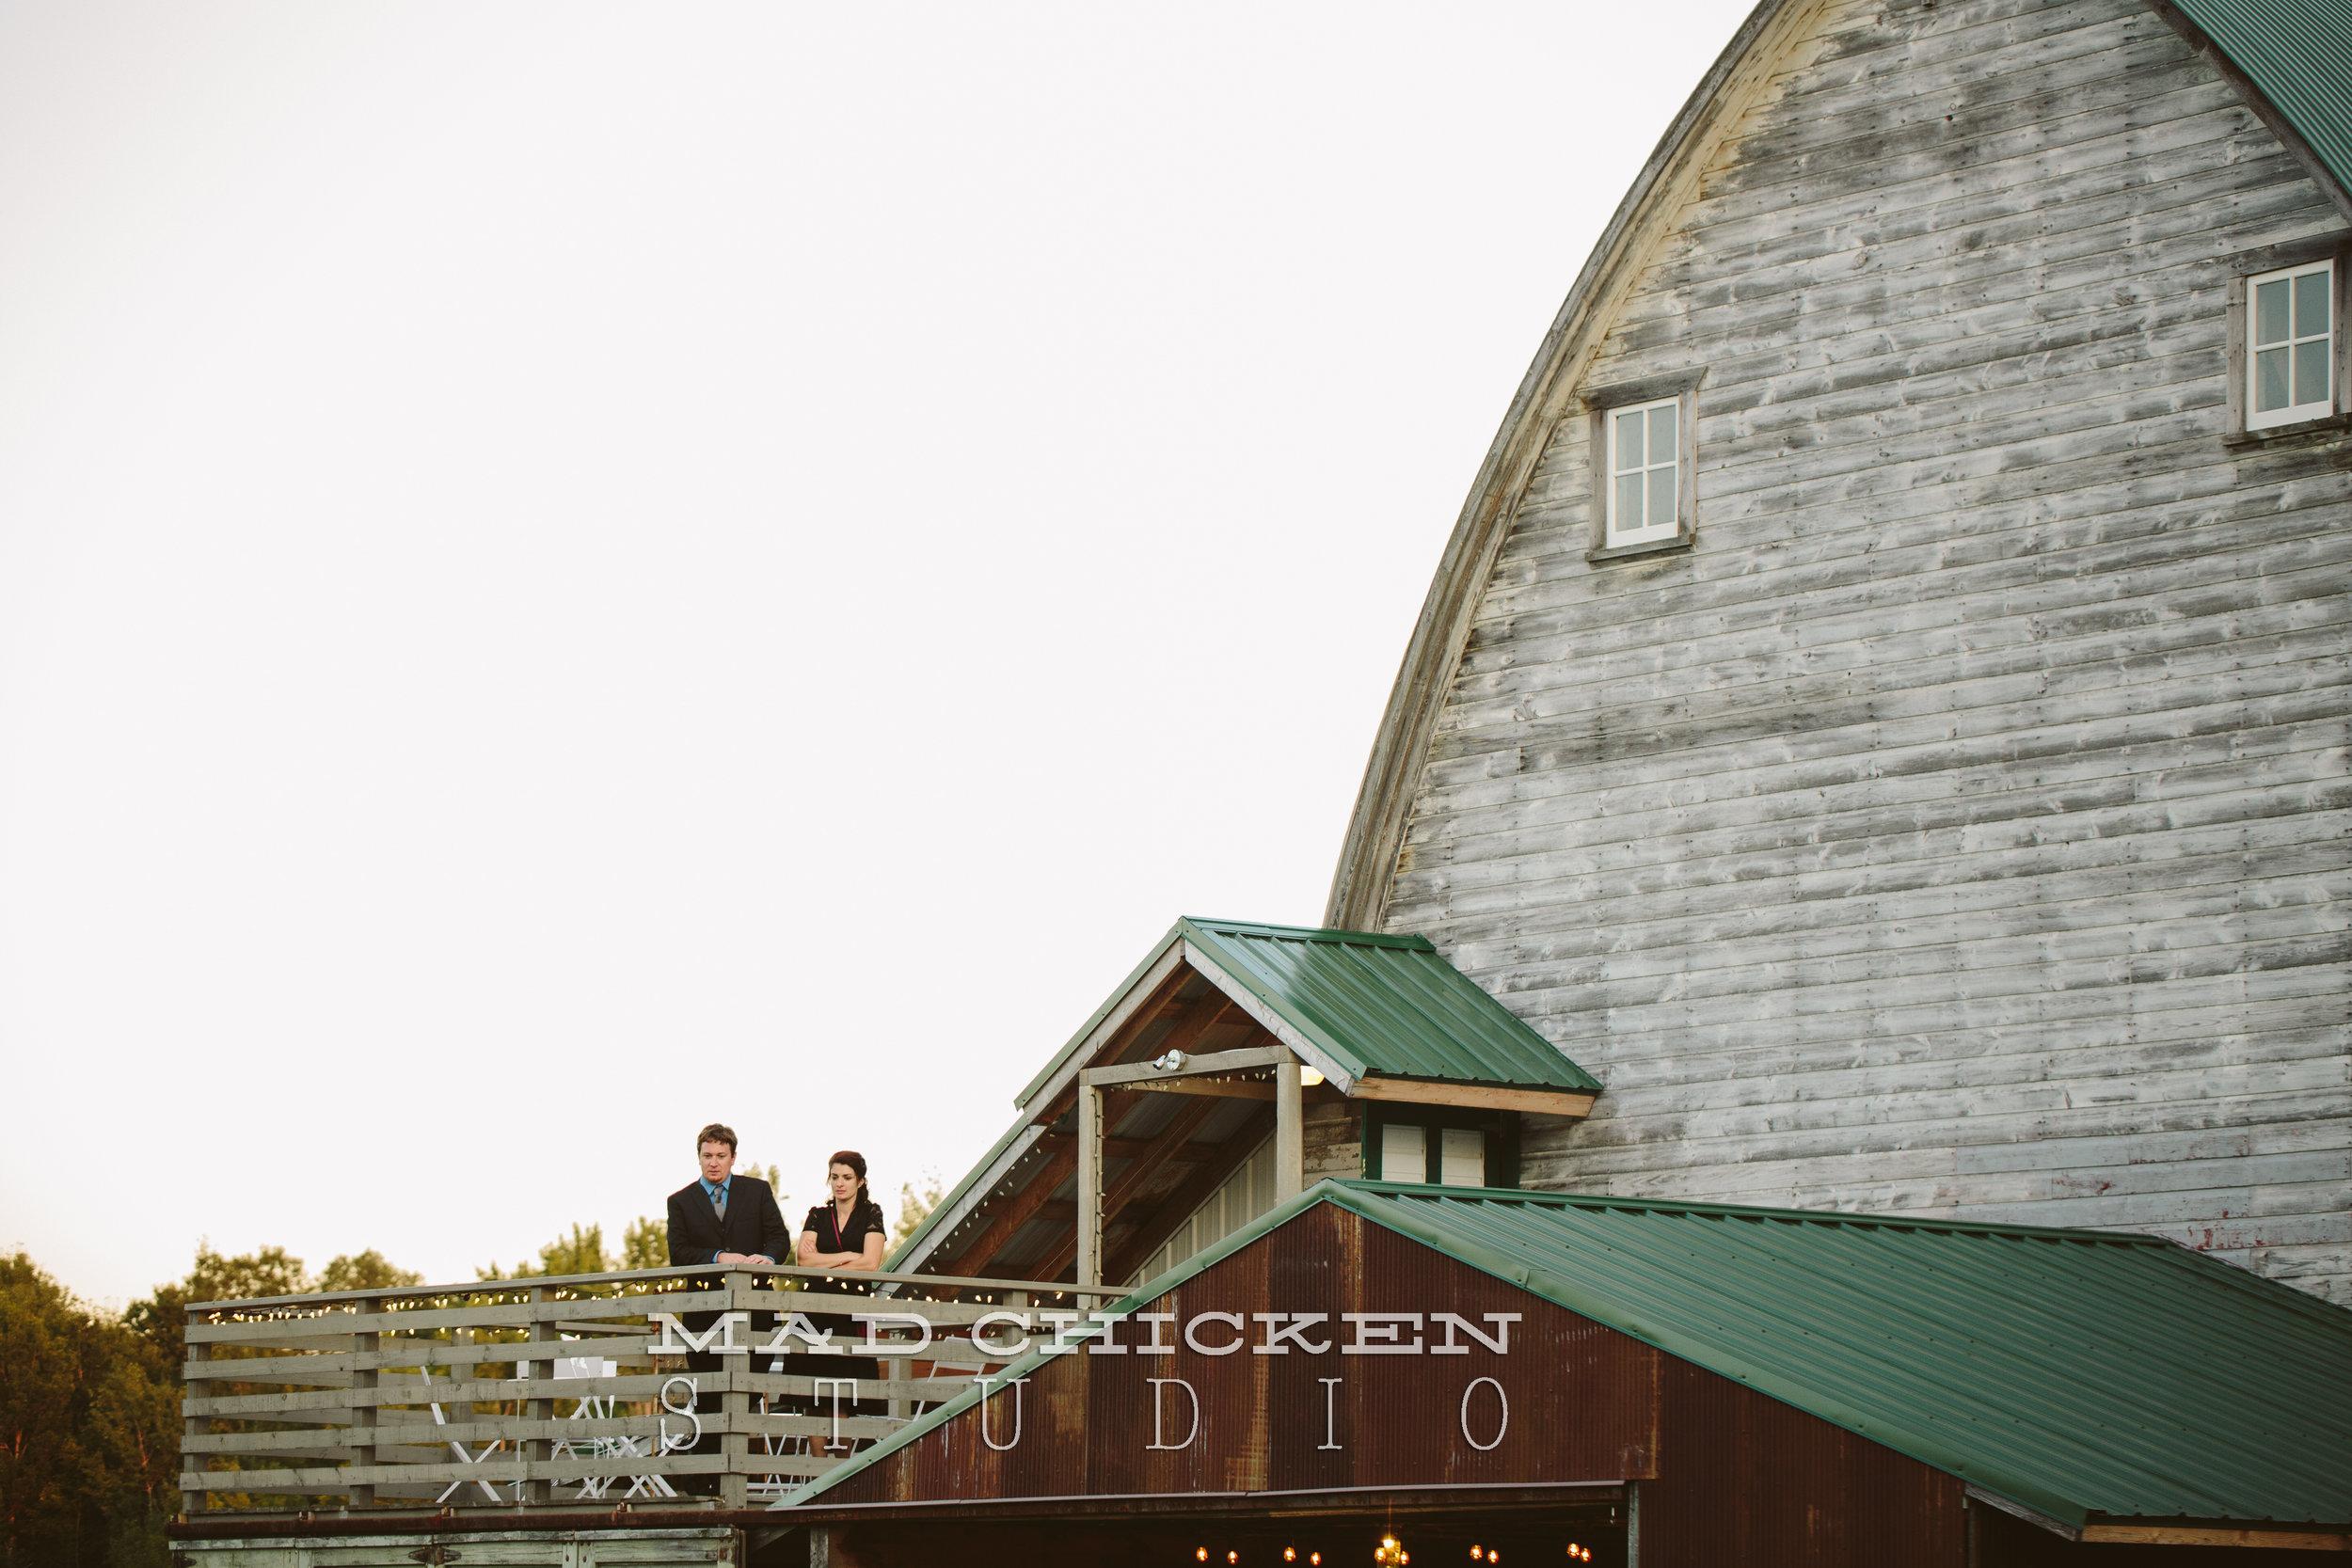 North side of barn/upper deck